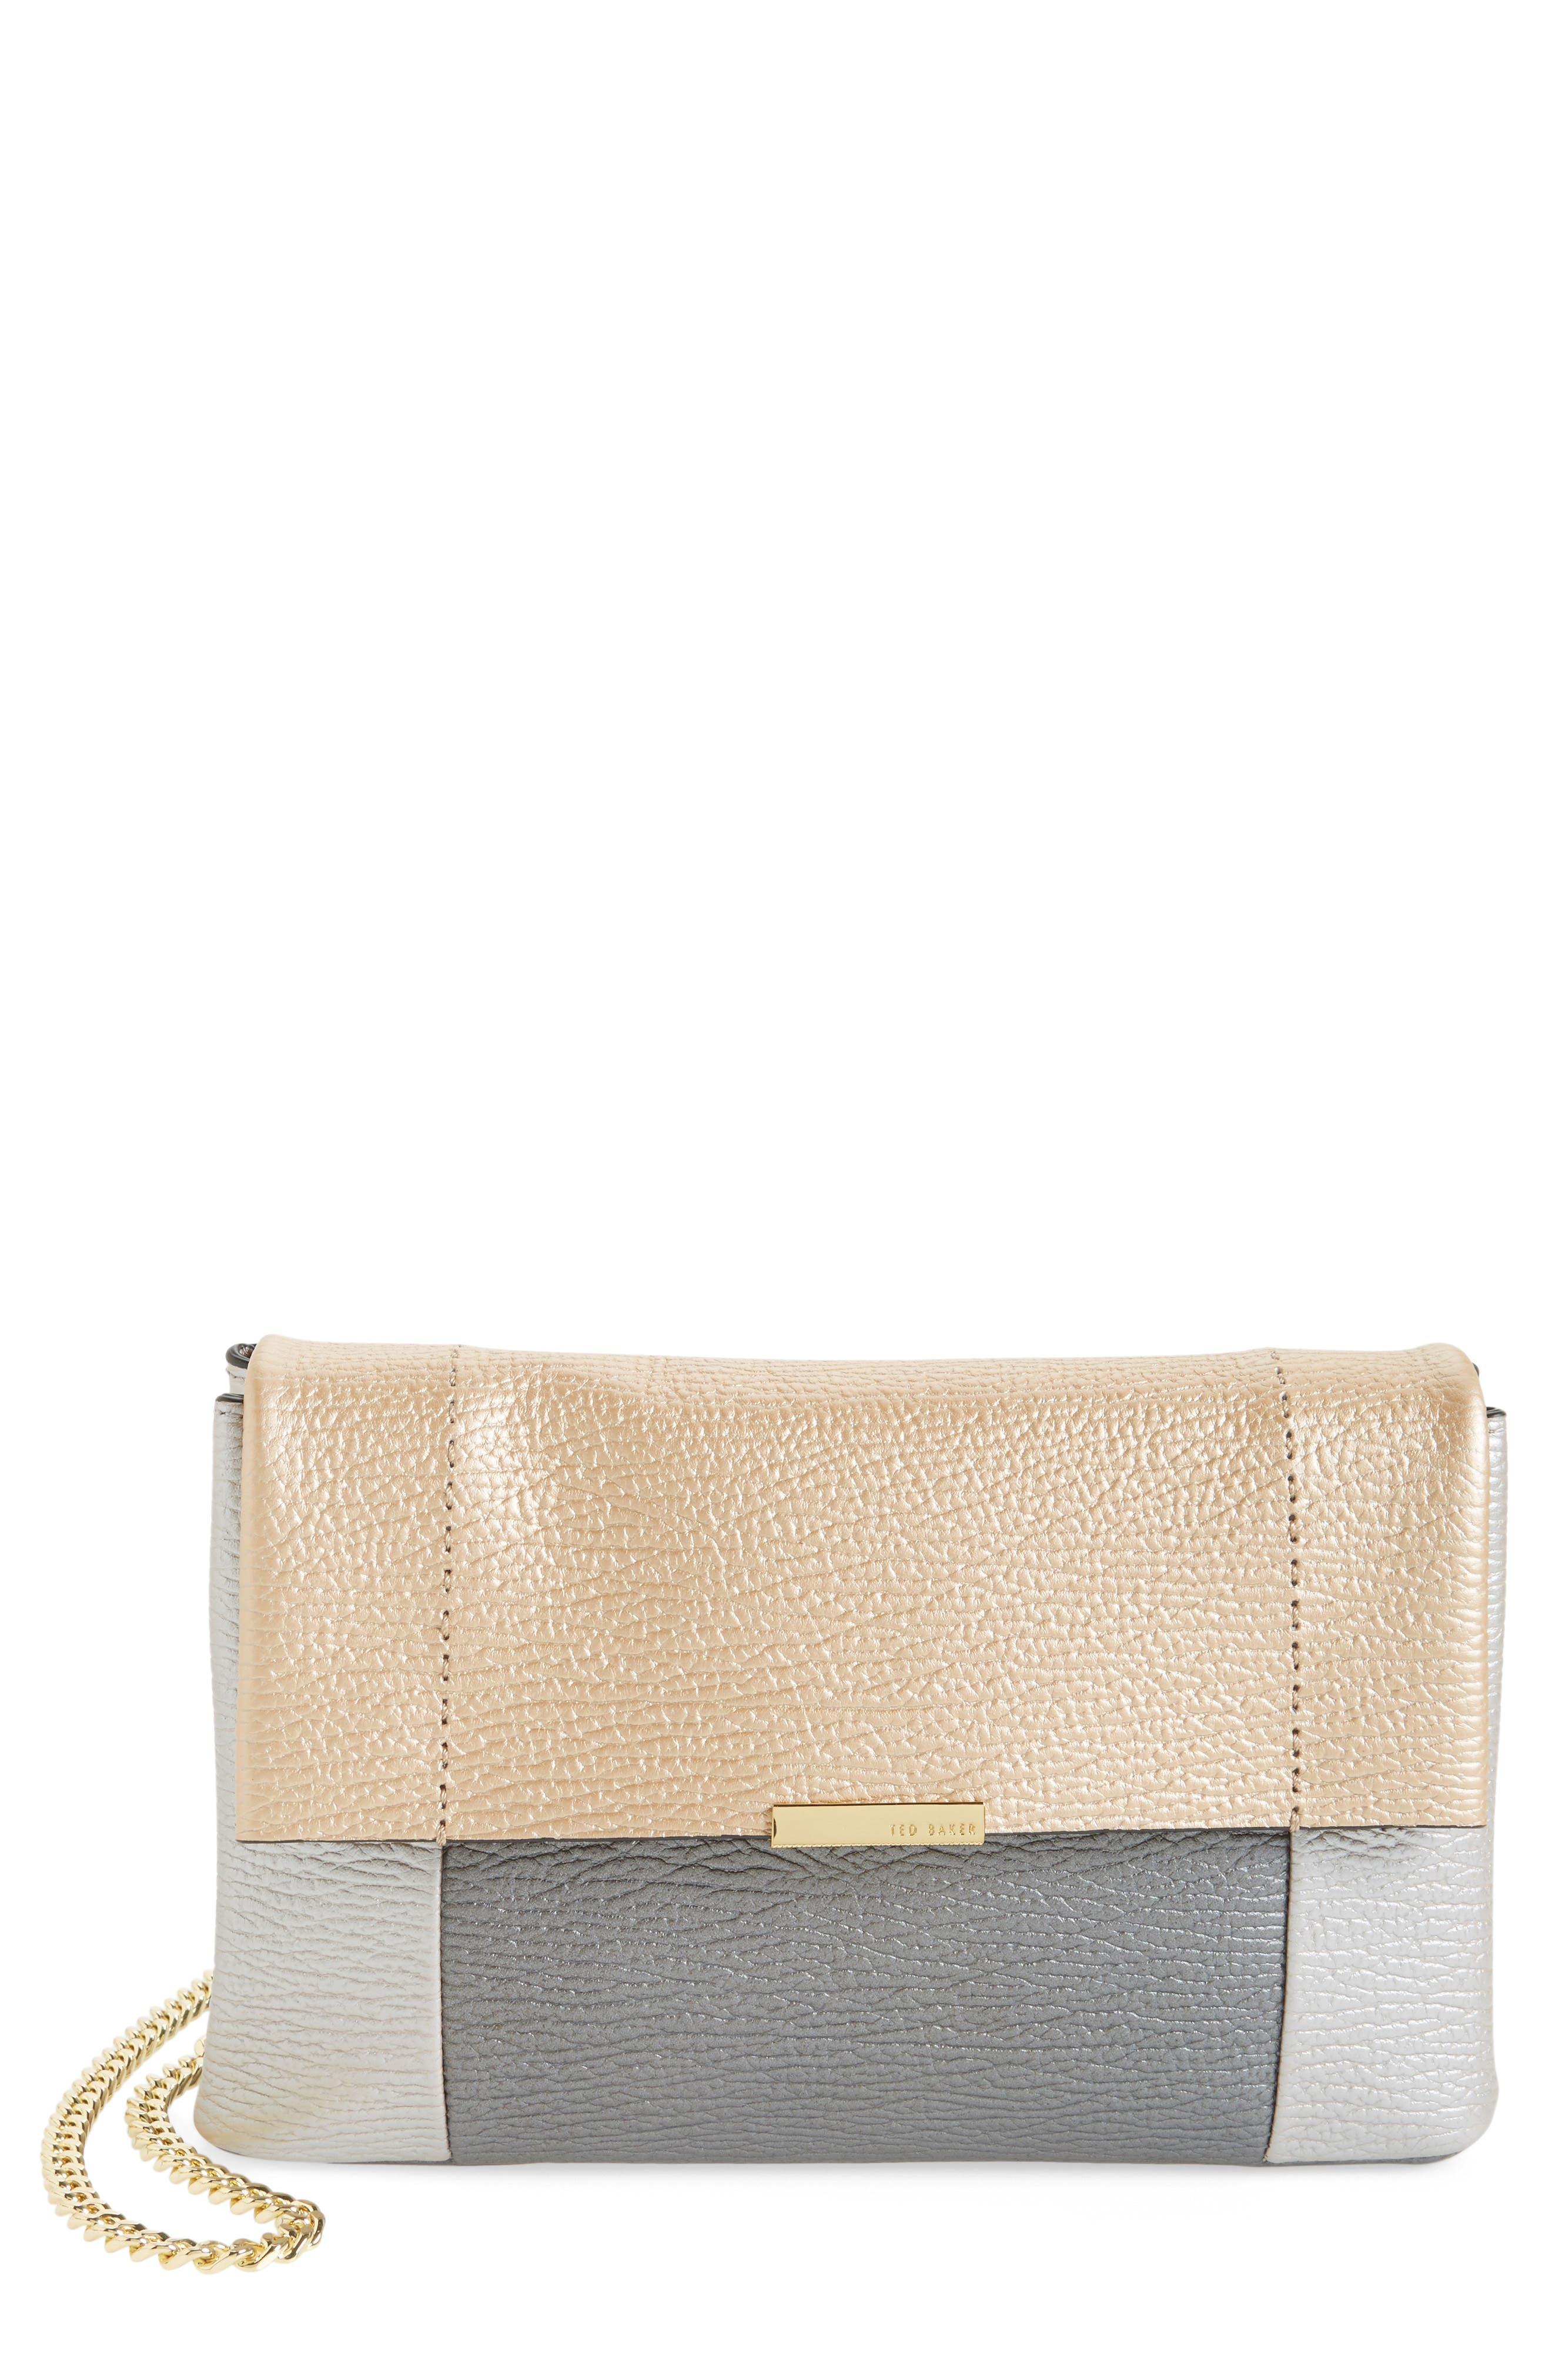 Ted Baker London 'Parson' Pebbled Leather Crossbody Bag